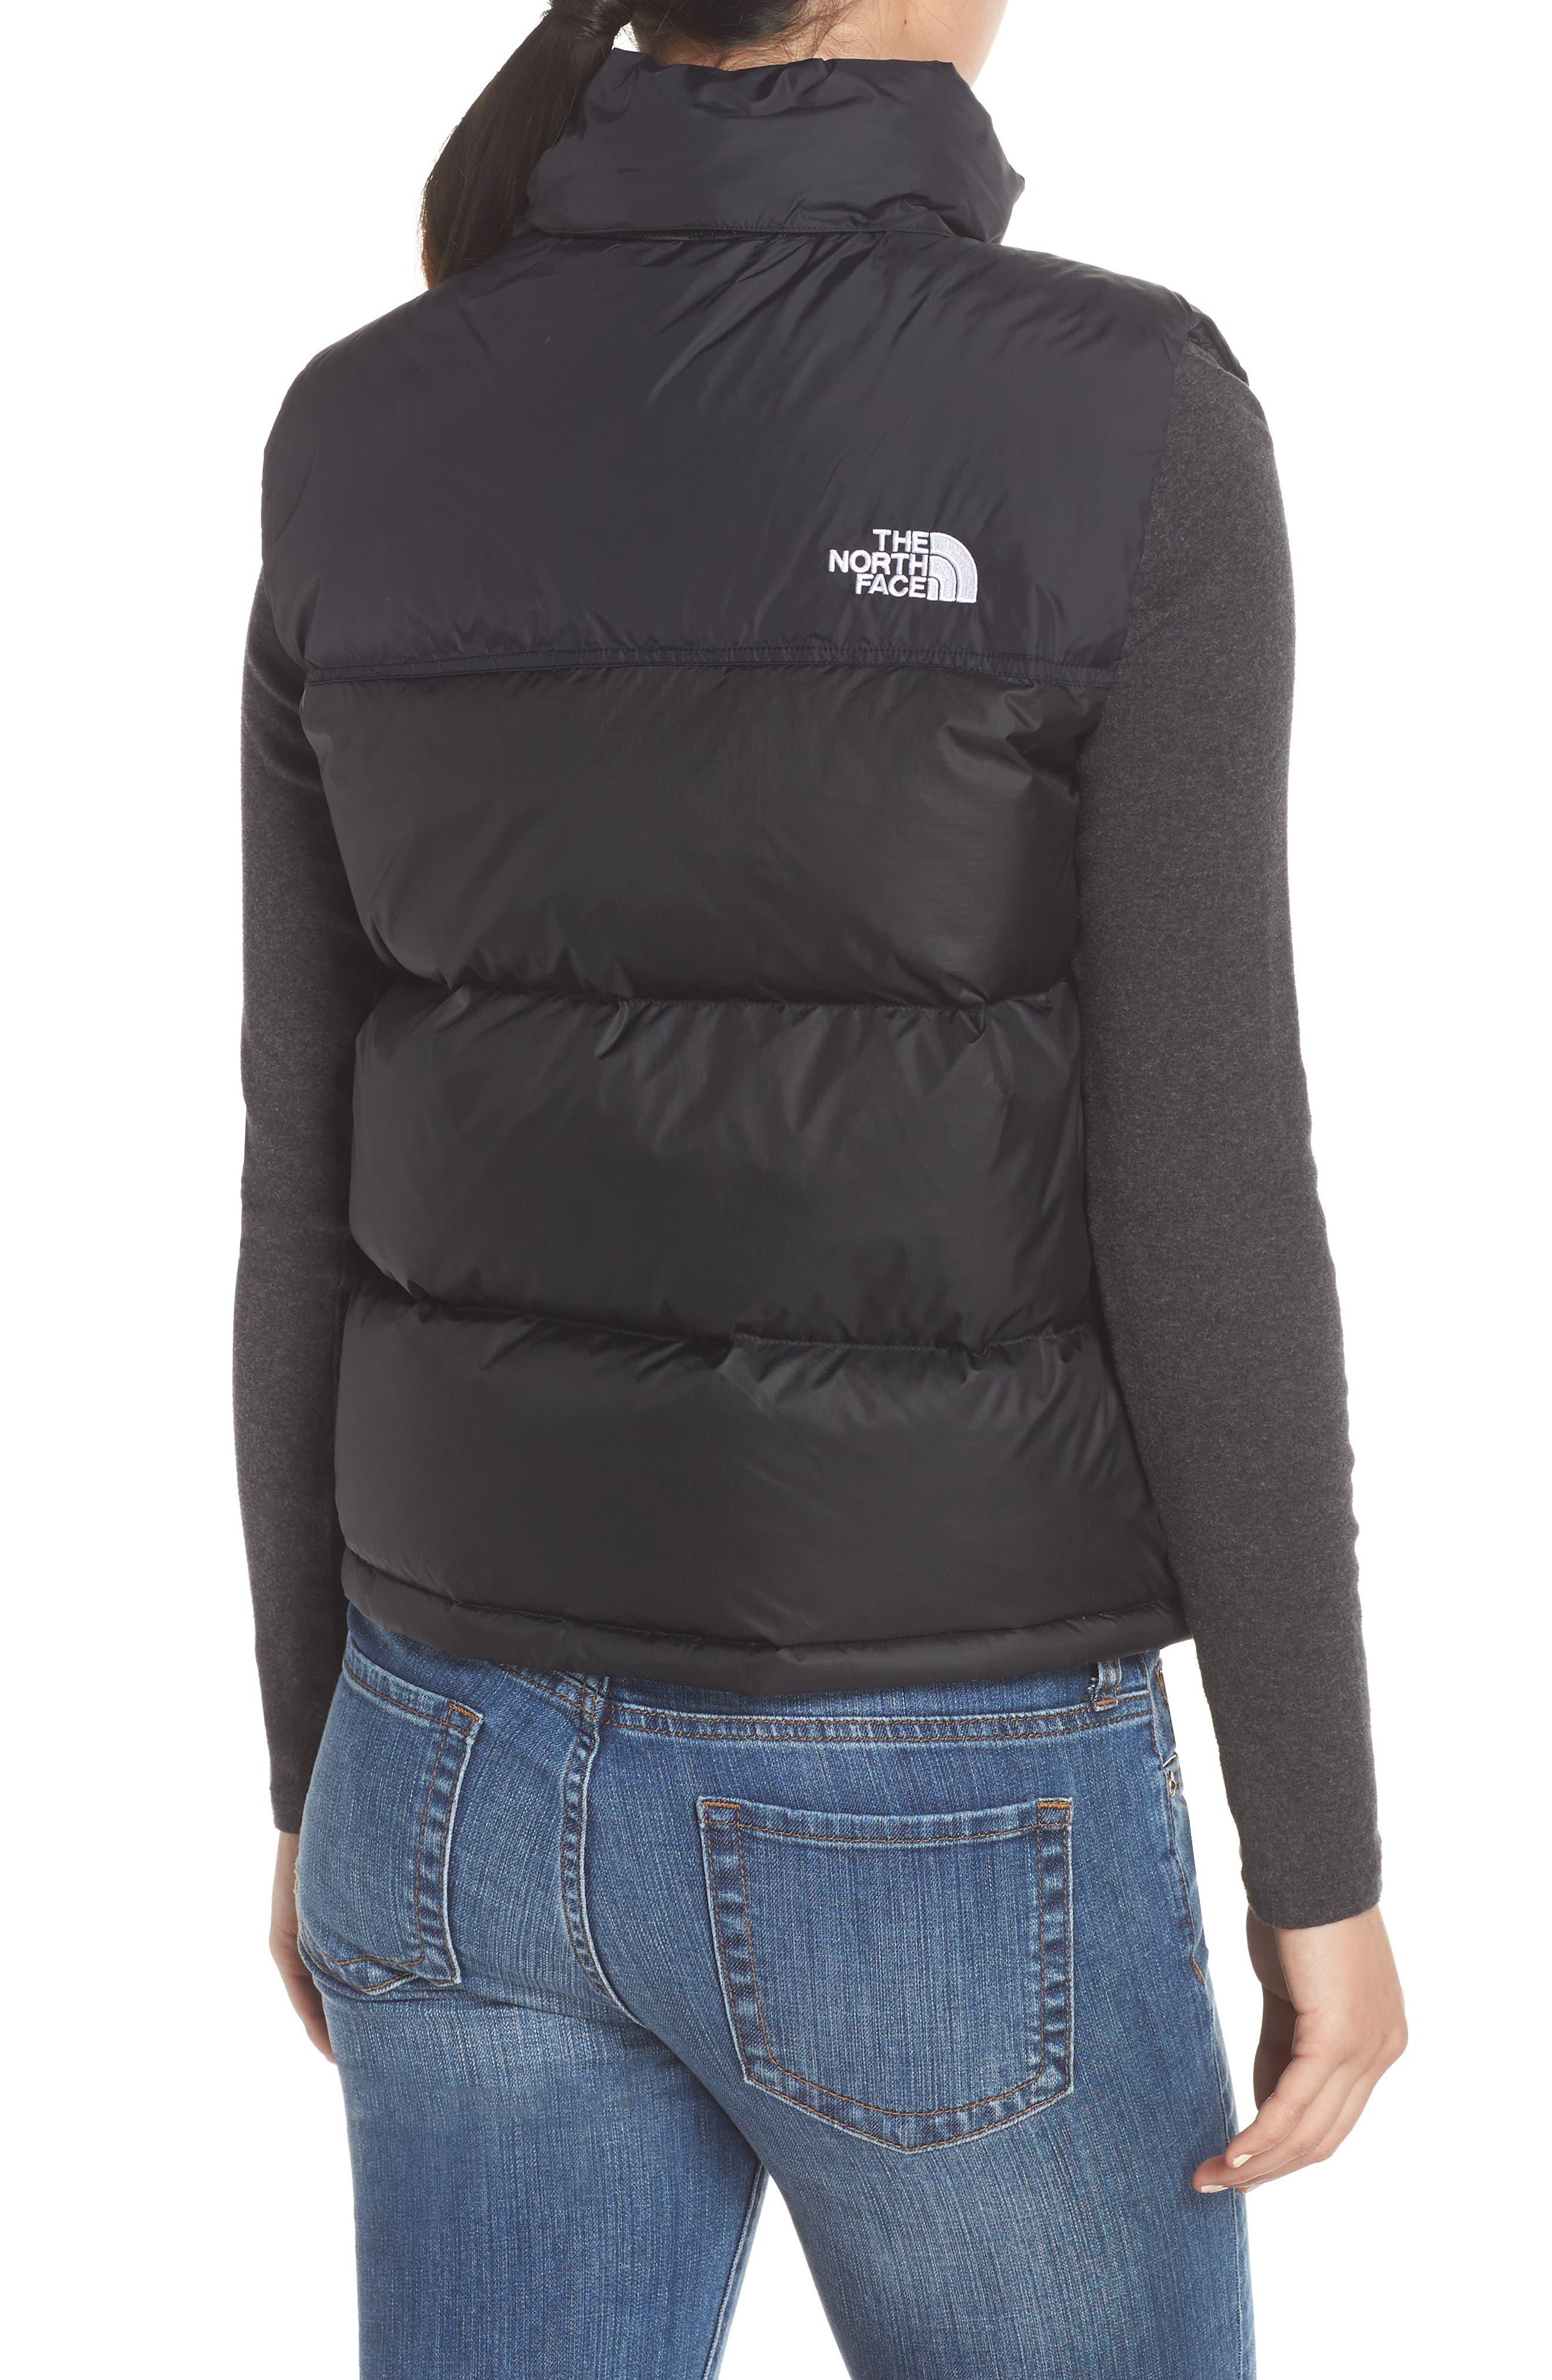 Nuptse 1996 Packable 700-Fill Power Down Vest,                             Alternate thumbnail 2, color,                             TNF BLACK